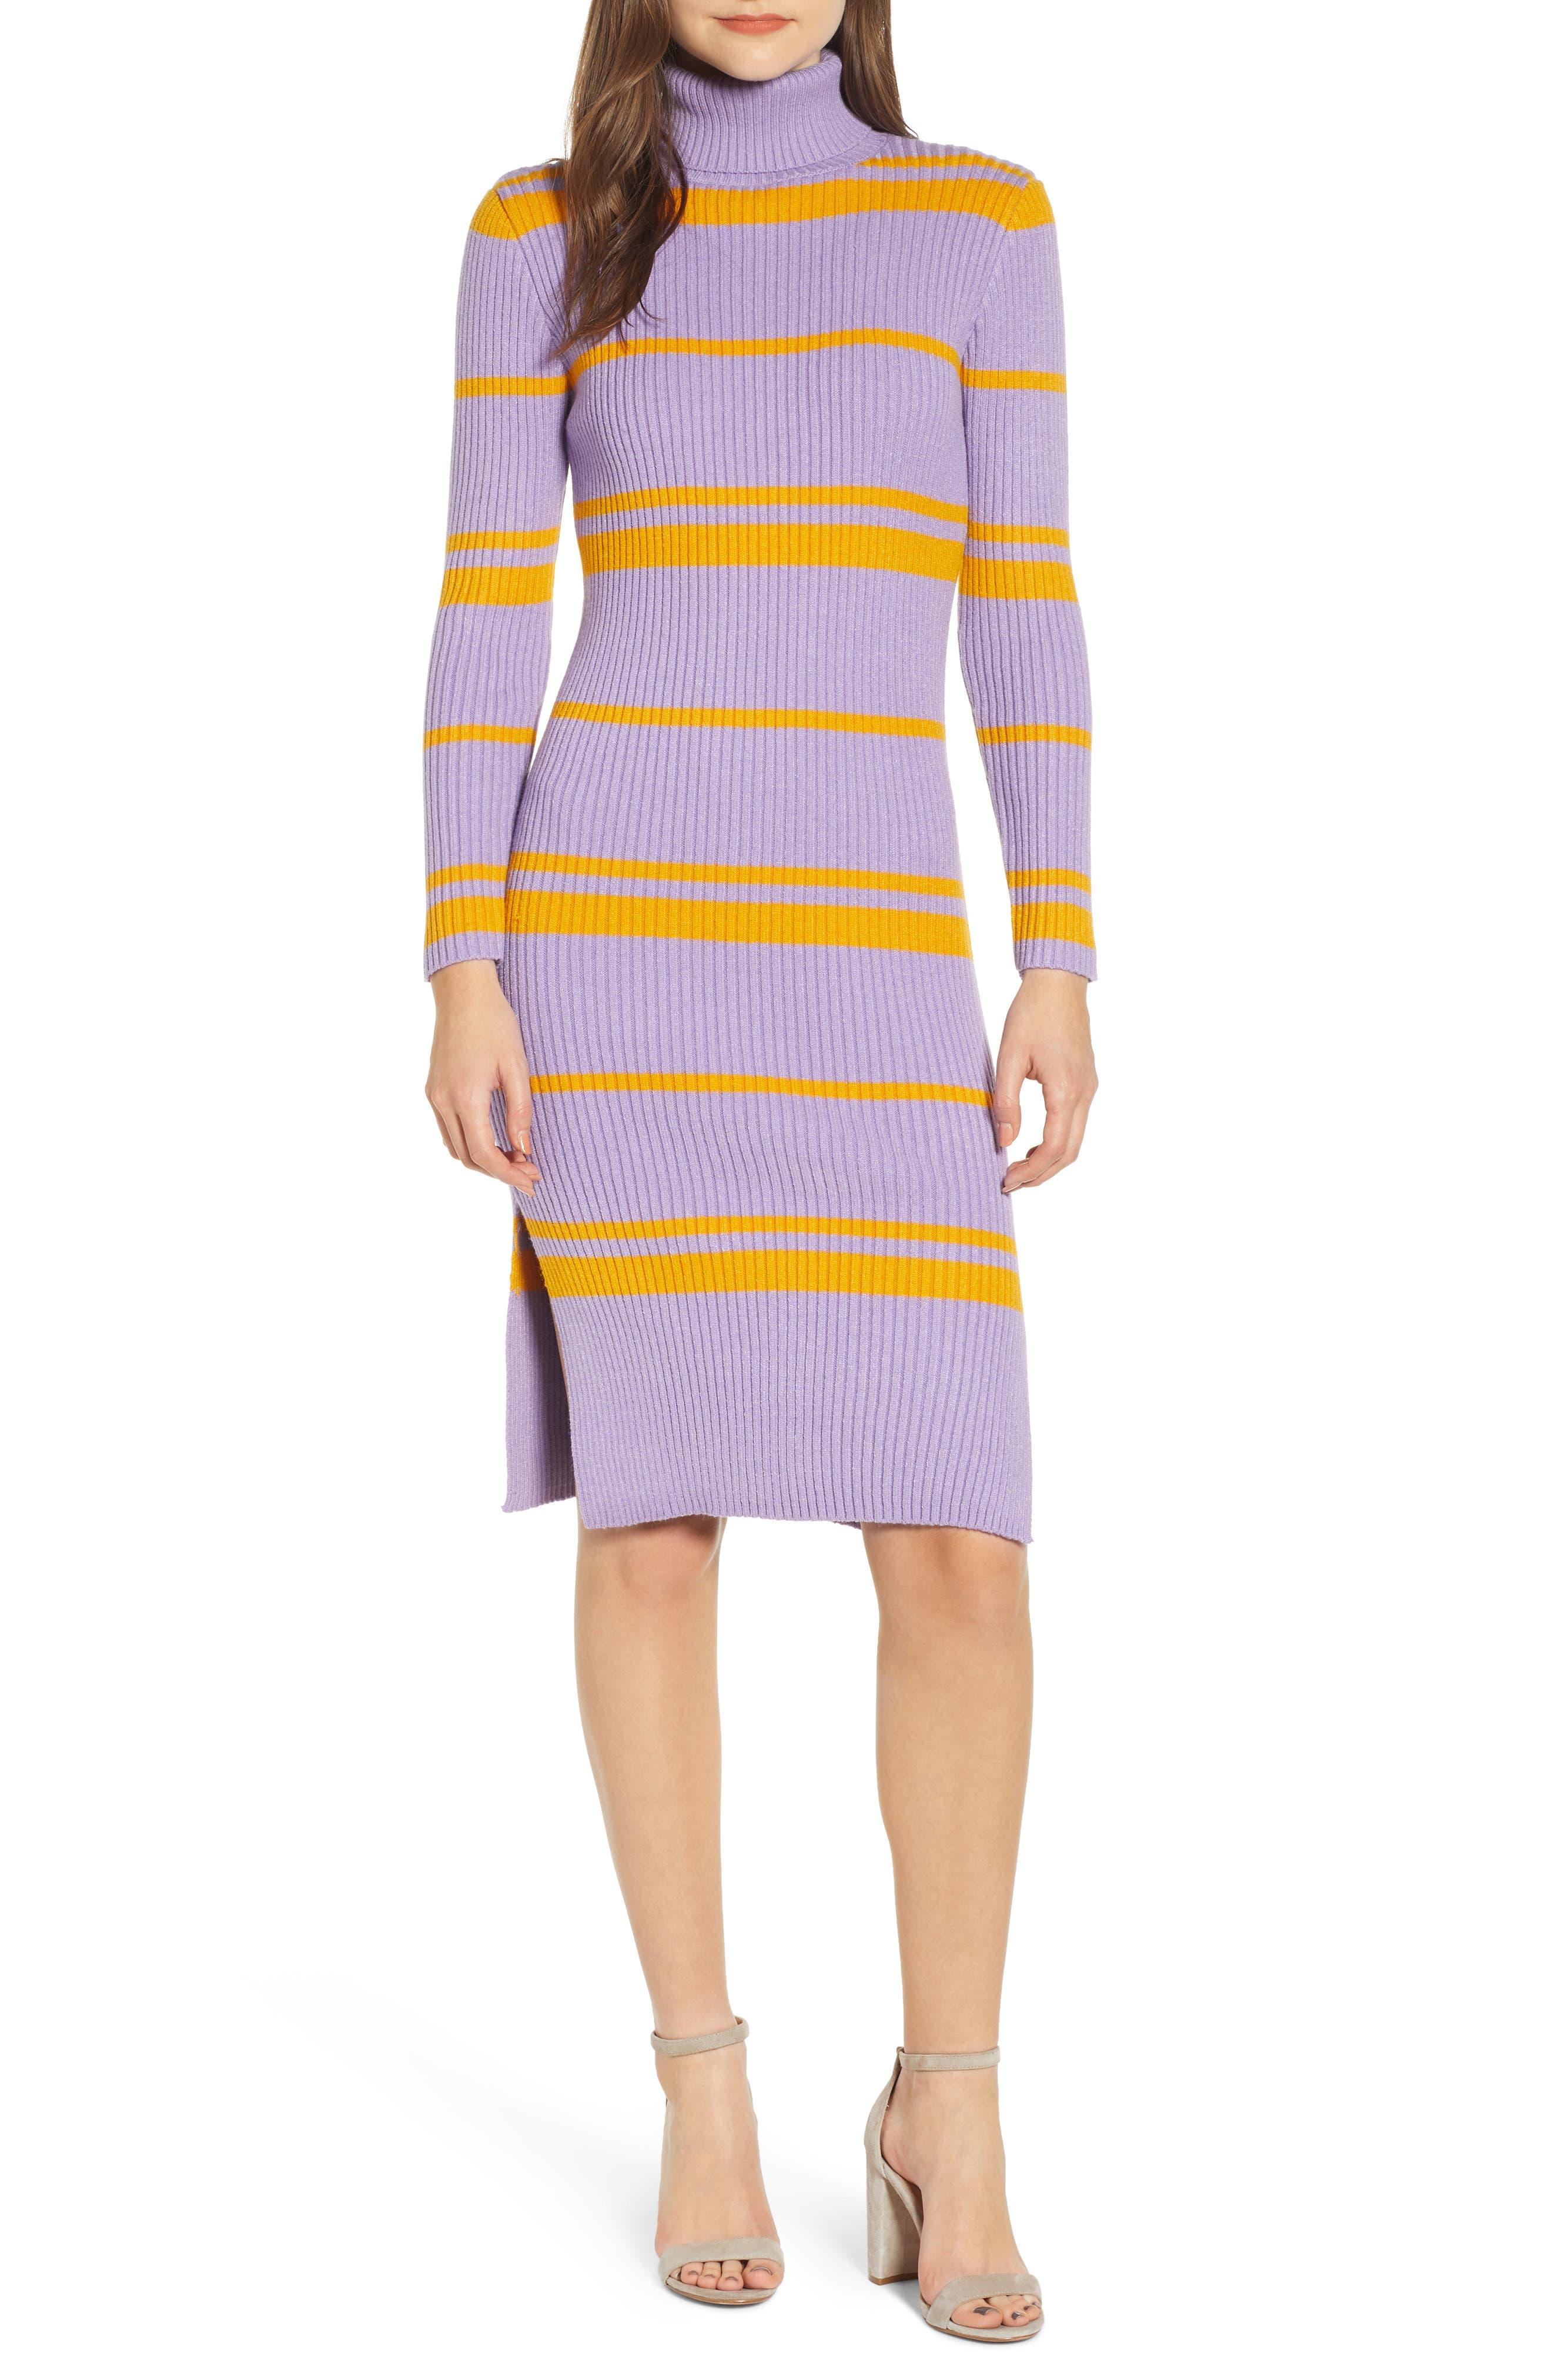 MOON RIVER Stripe Turtleneck Sweater Dress, Main, color, 500